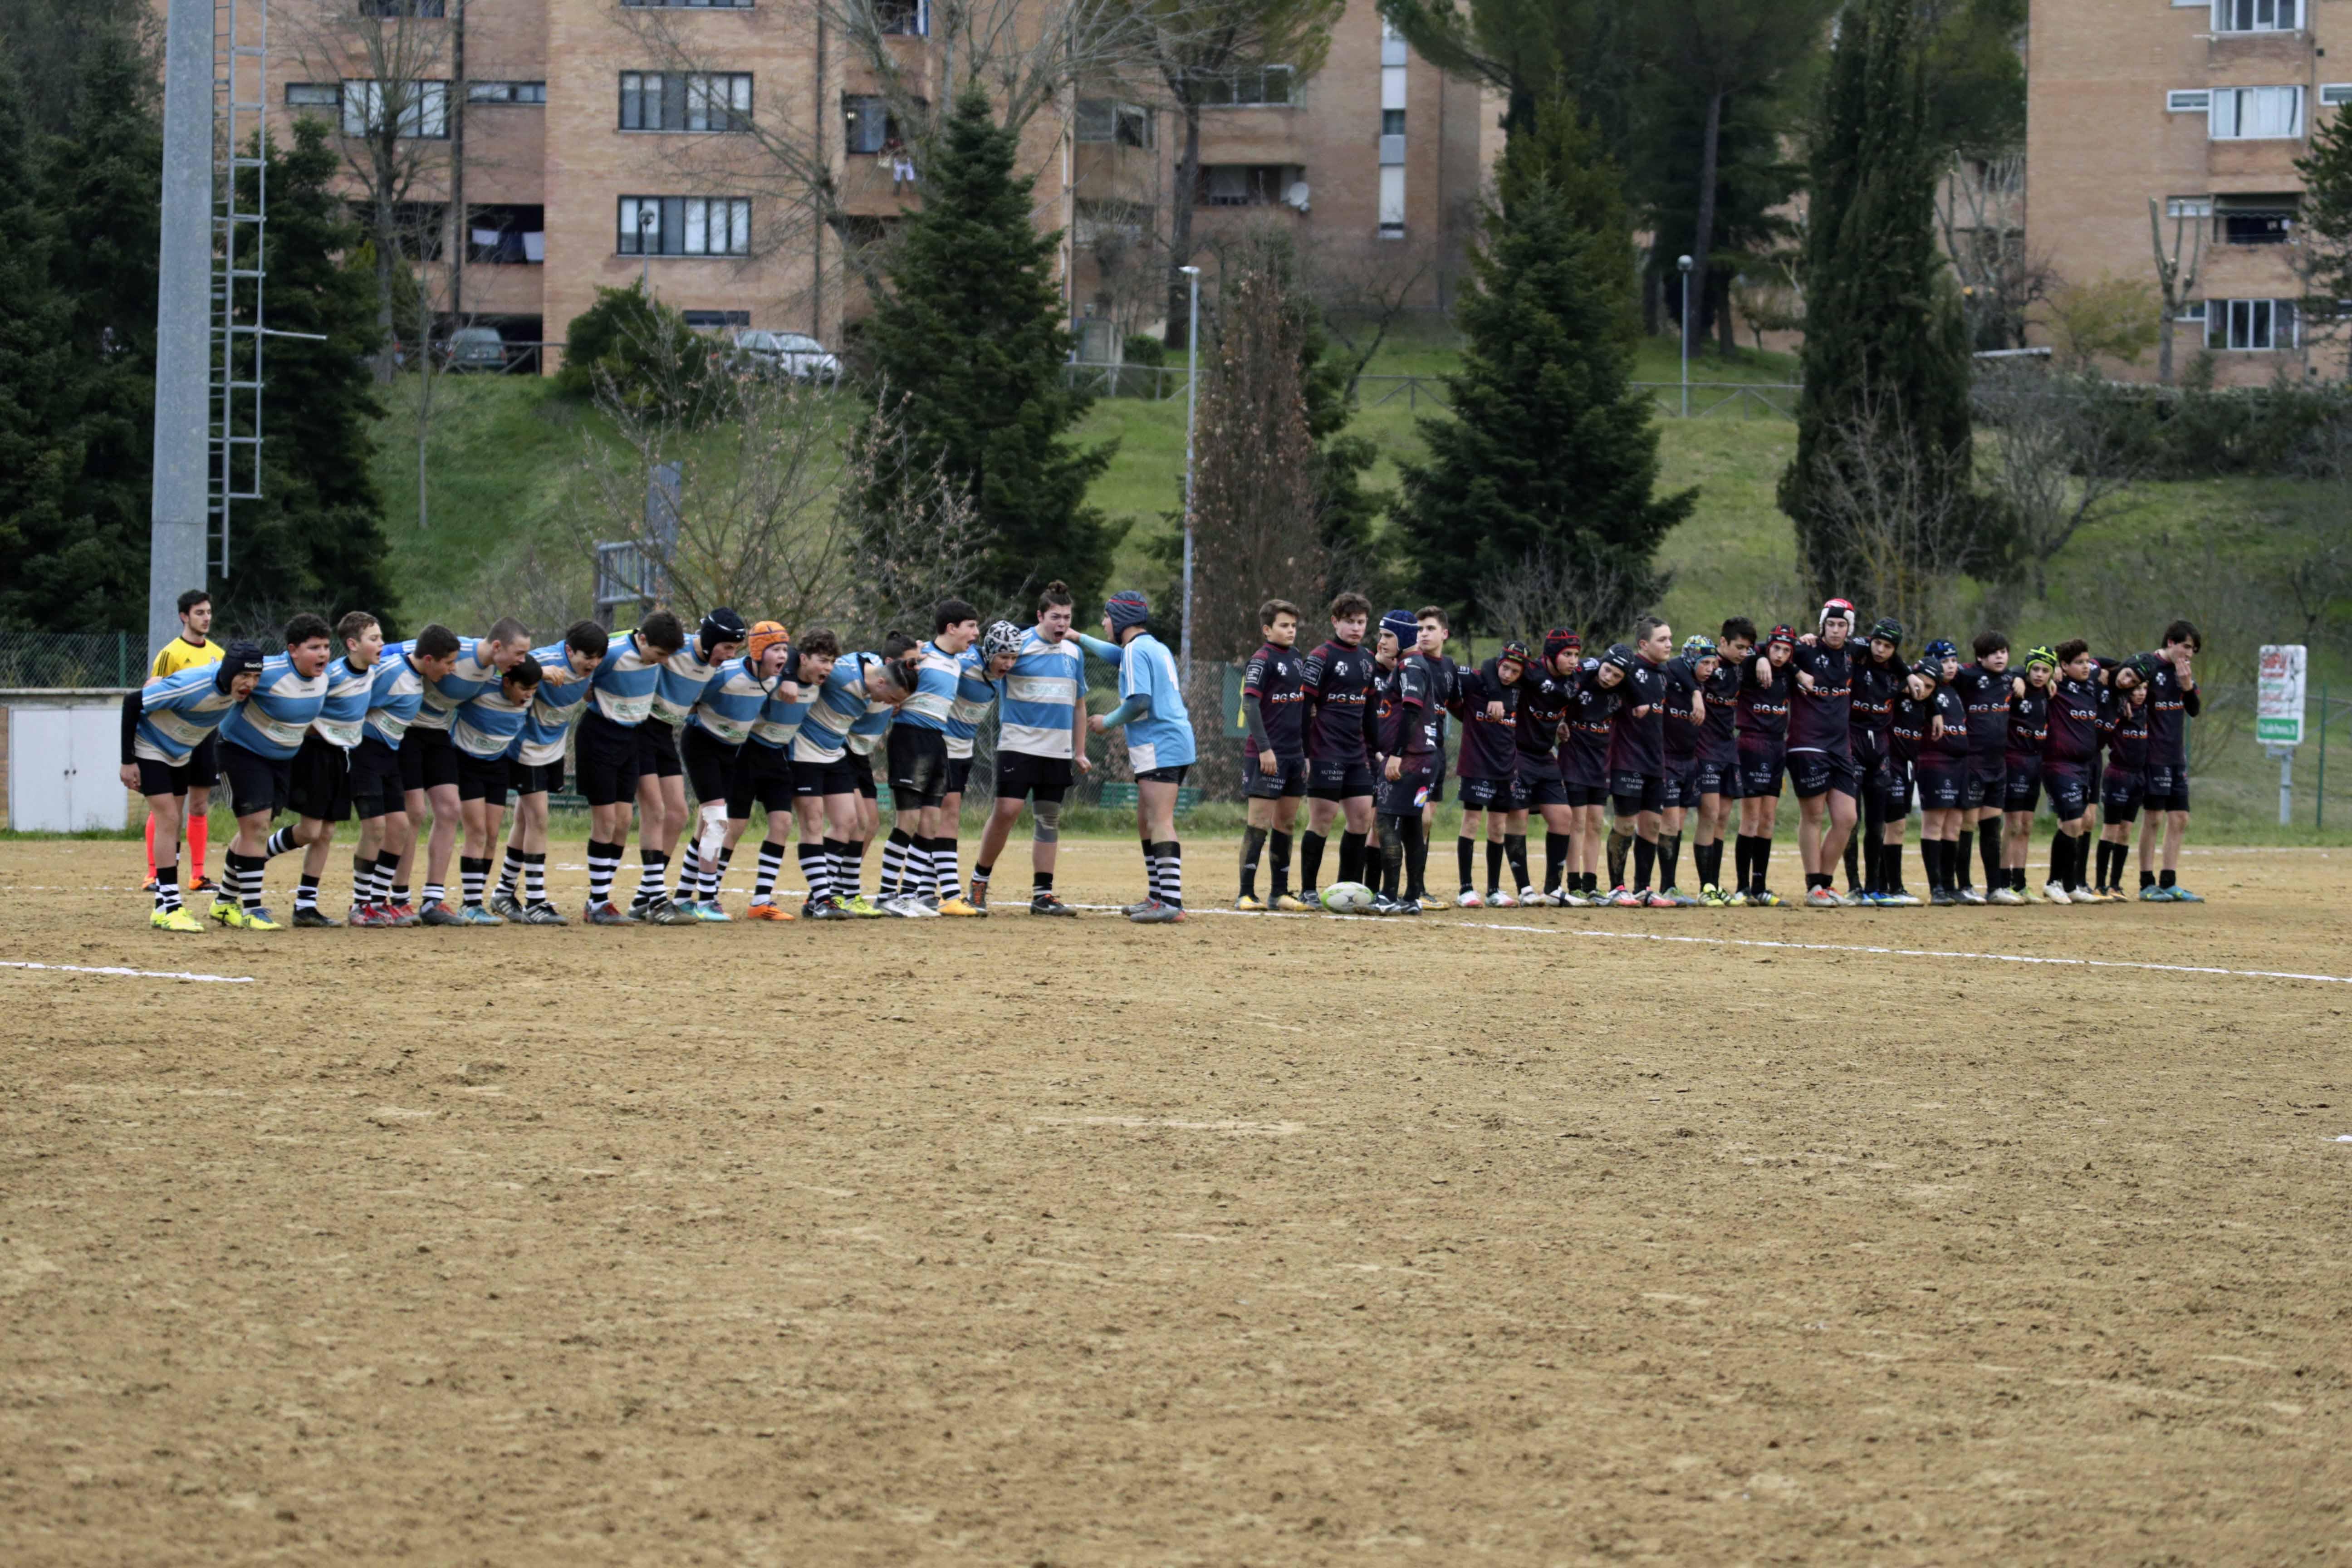 U14 Cus Siena Rugby vs Lions Amaranto Livorno